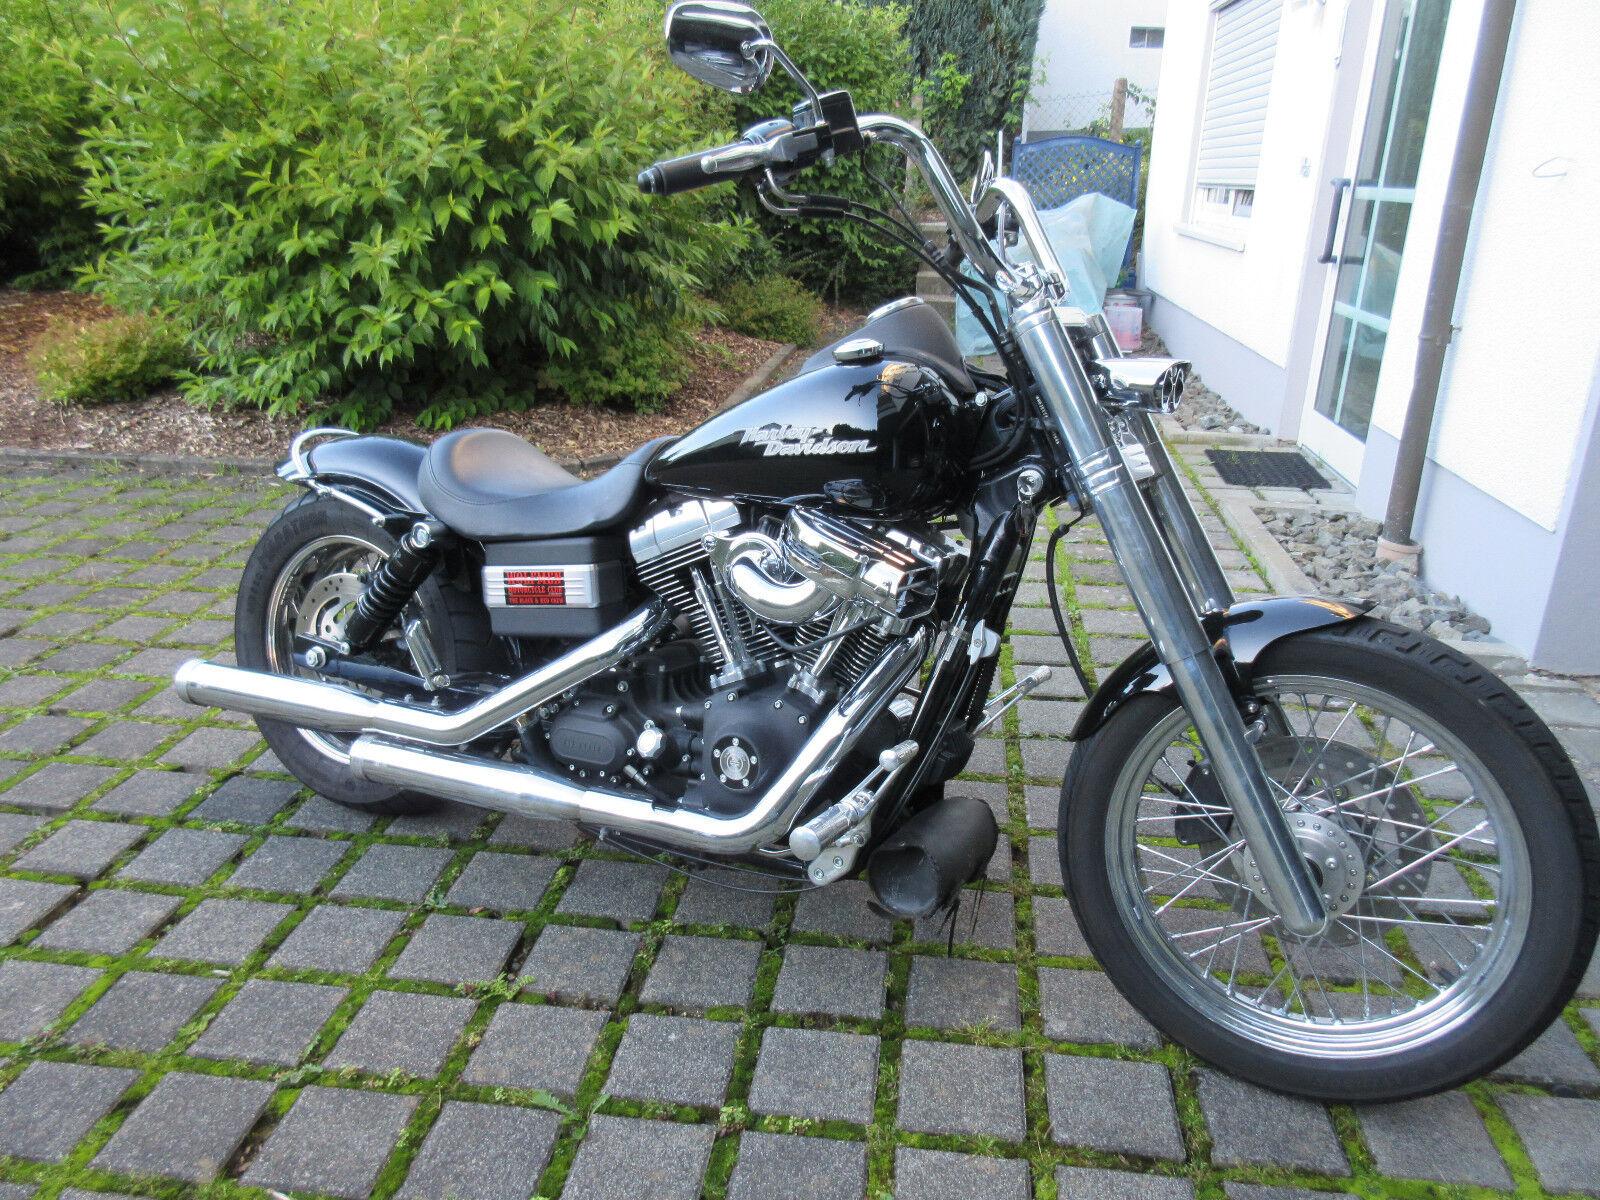 Harley Davidson Street Bob, modifiziert, top Zustand